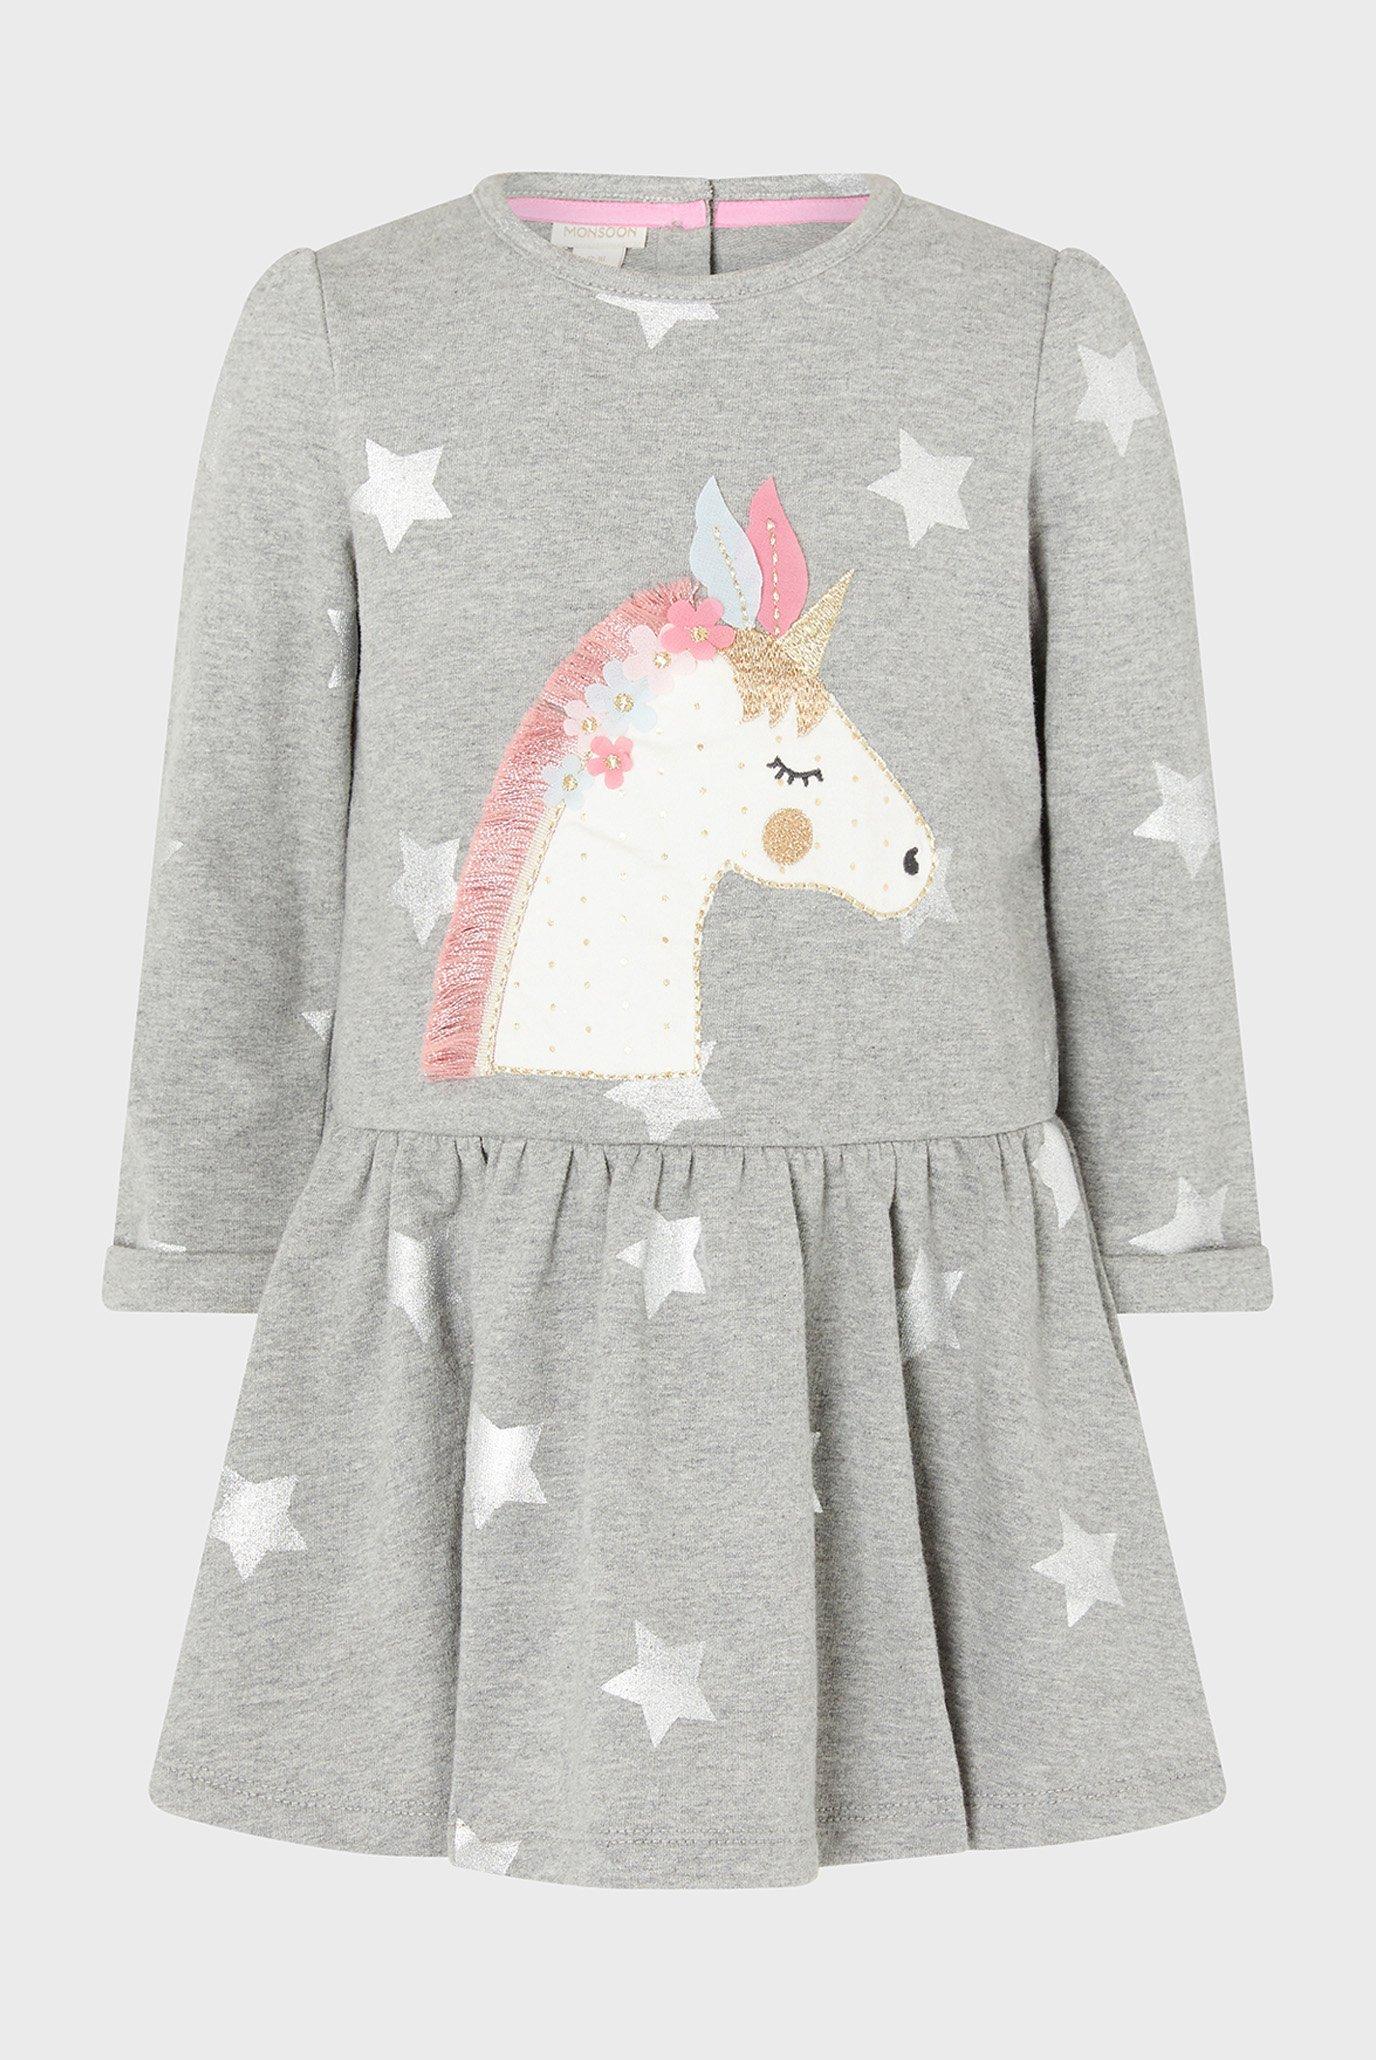 Дитяча сіра сукня GREY BABY UNICORN ST 1